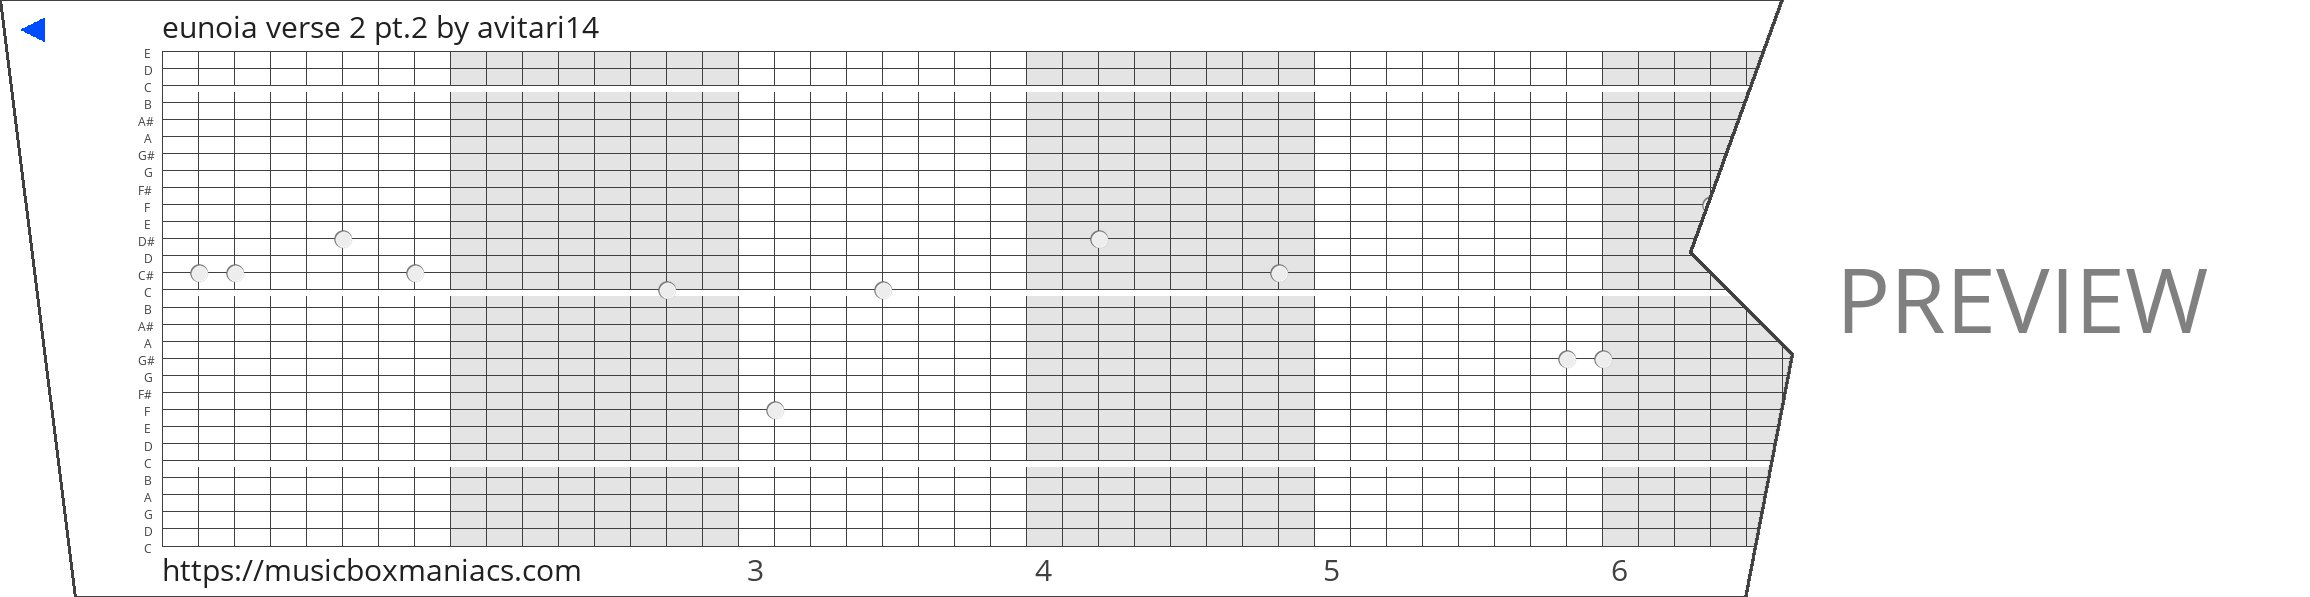 eunoia verse 2 pt.2 30 note music box paper strip